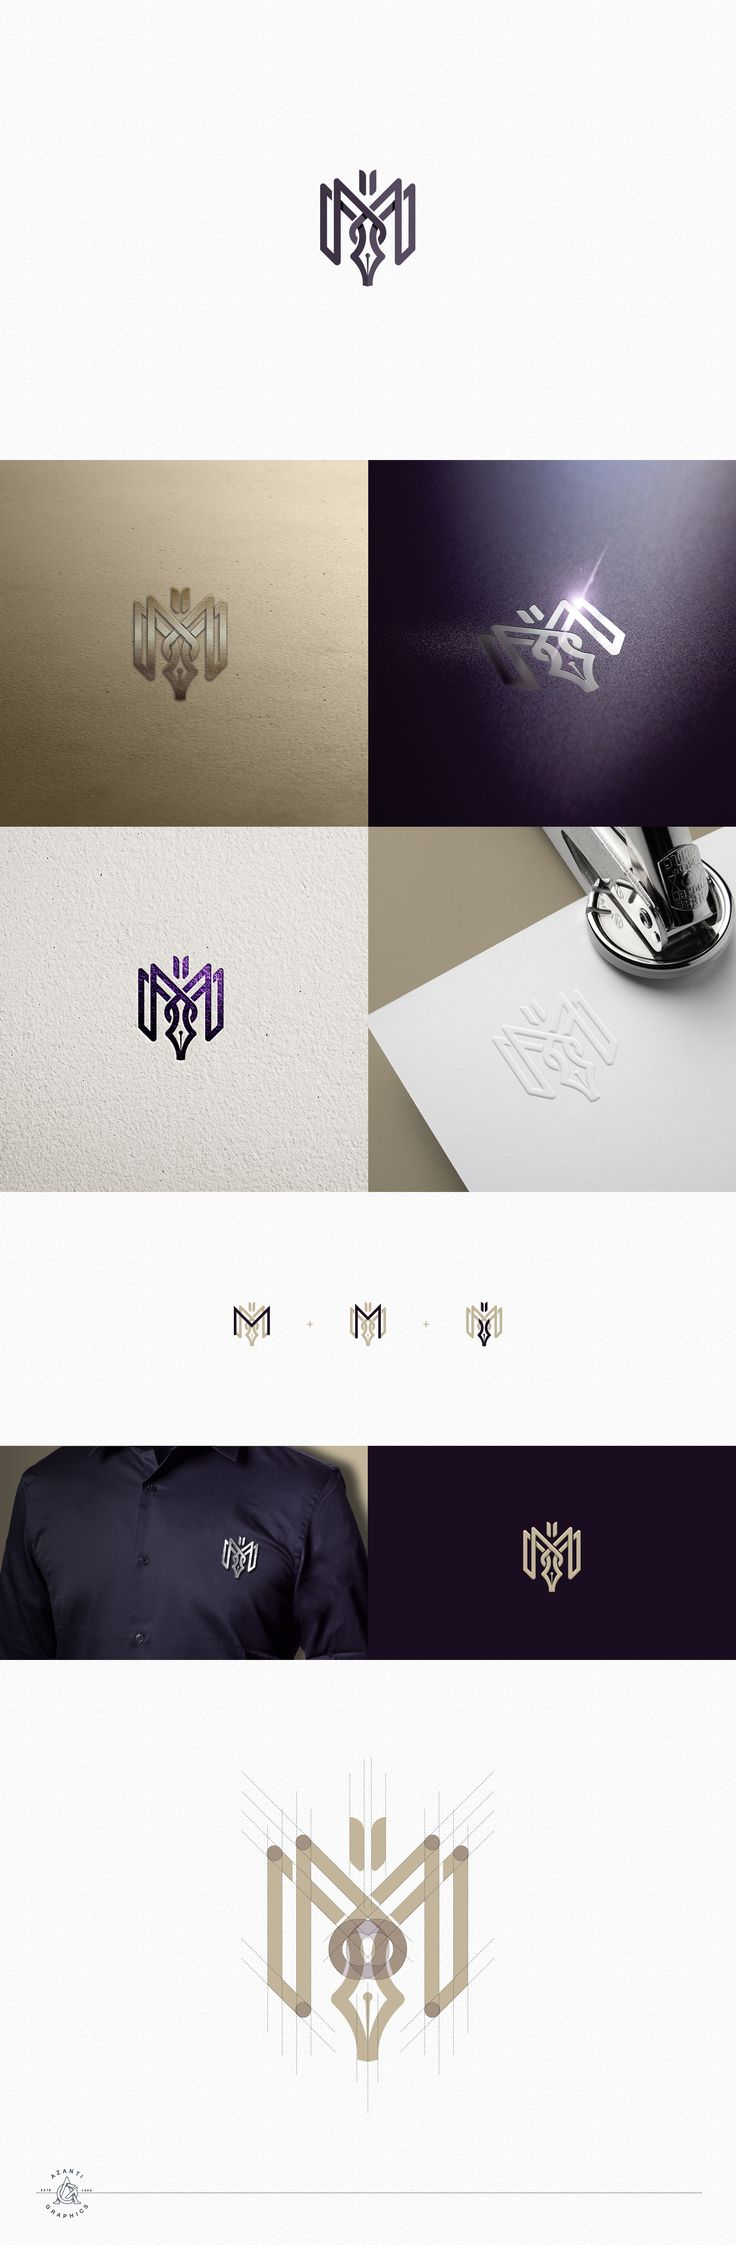 Logo presentation   m m pen